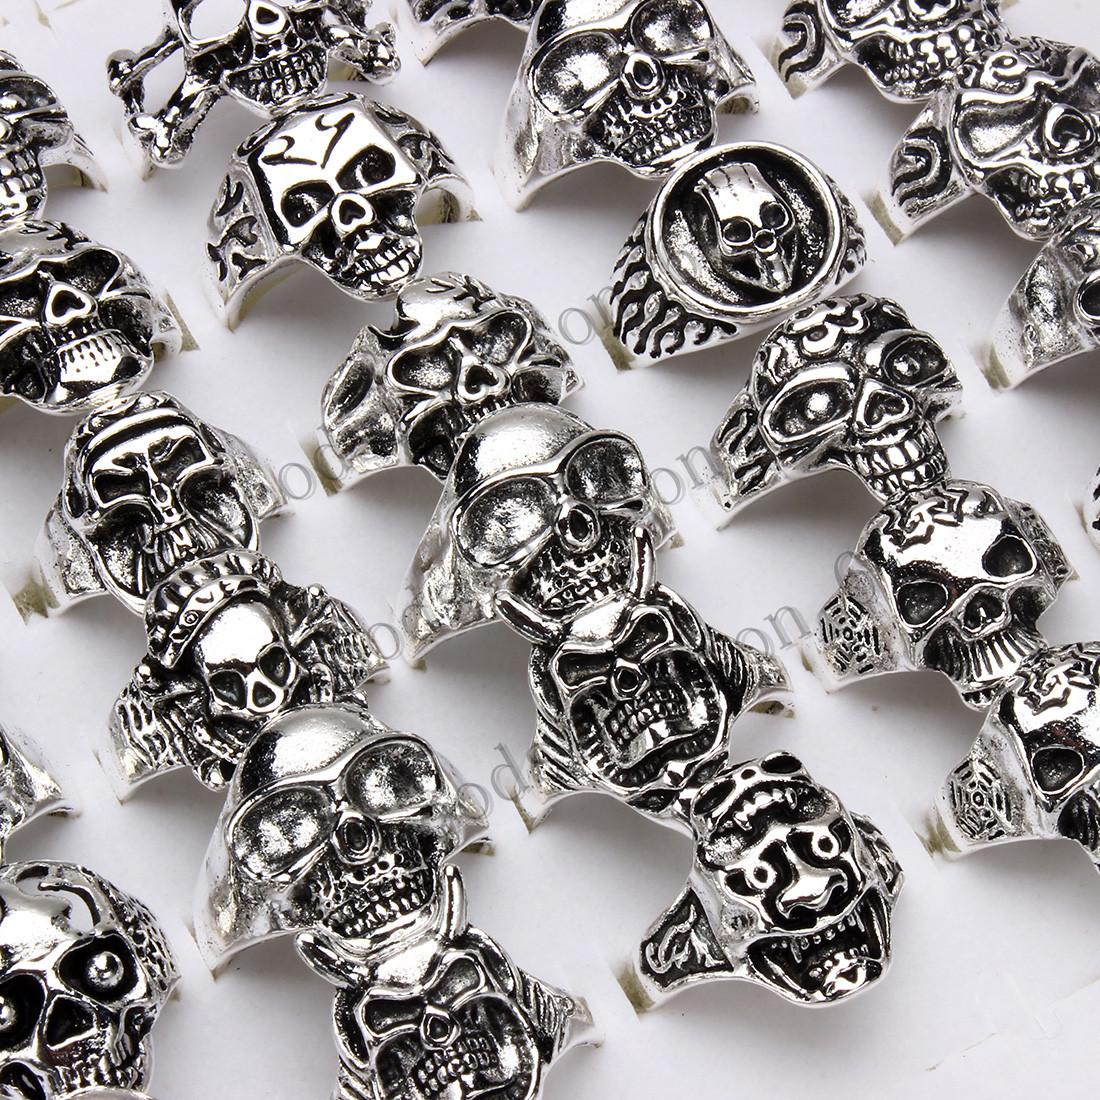 20pcs Lots Big Gothic Skull and Animal  Men/'s Anti Silver Rings Punk Retro Free